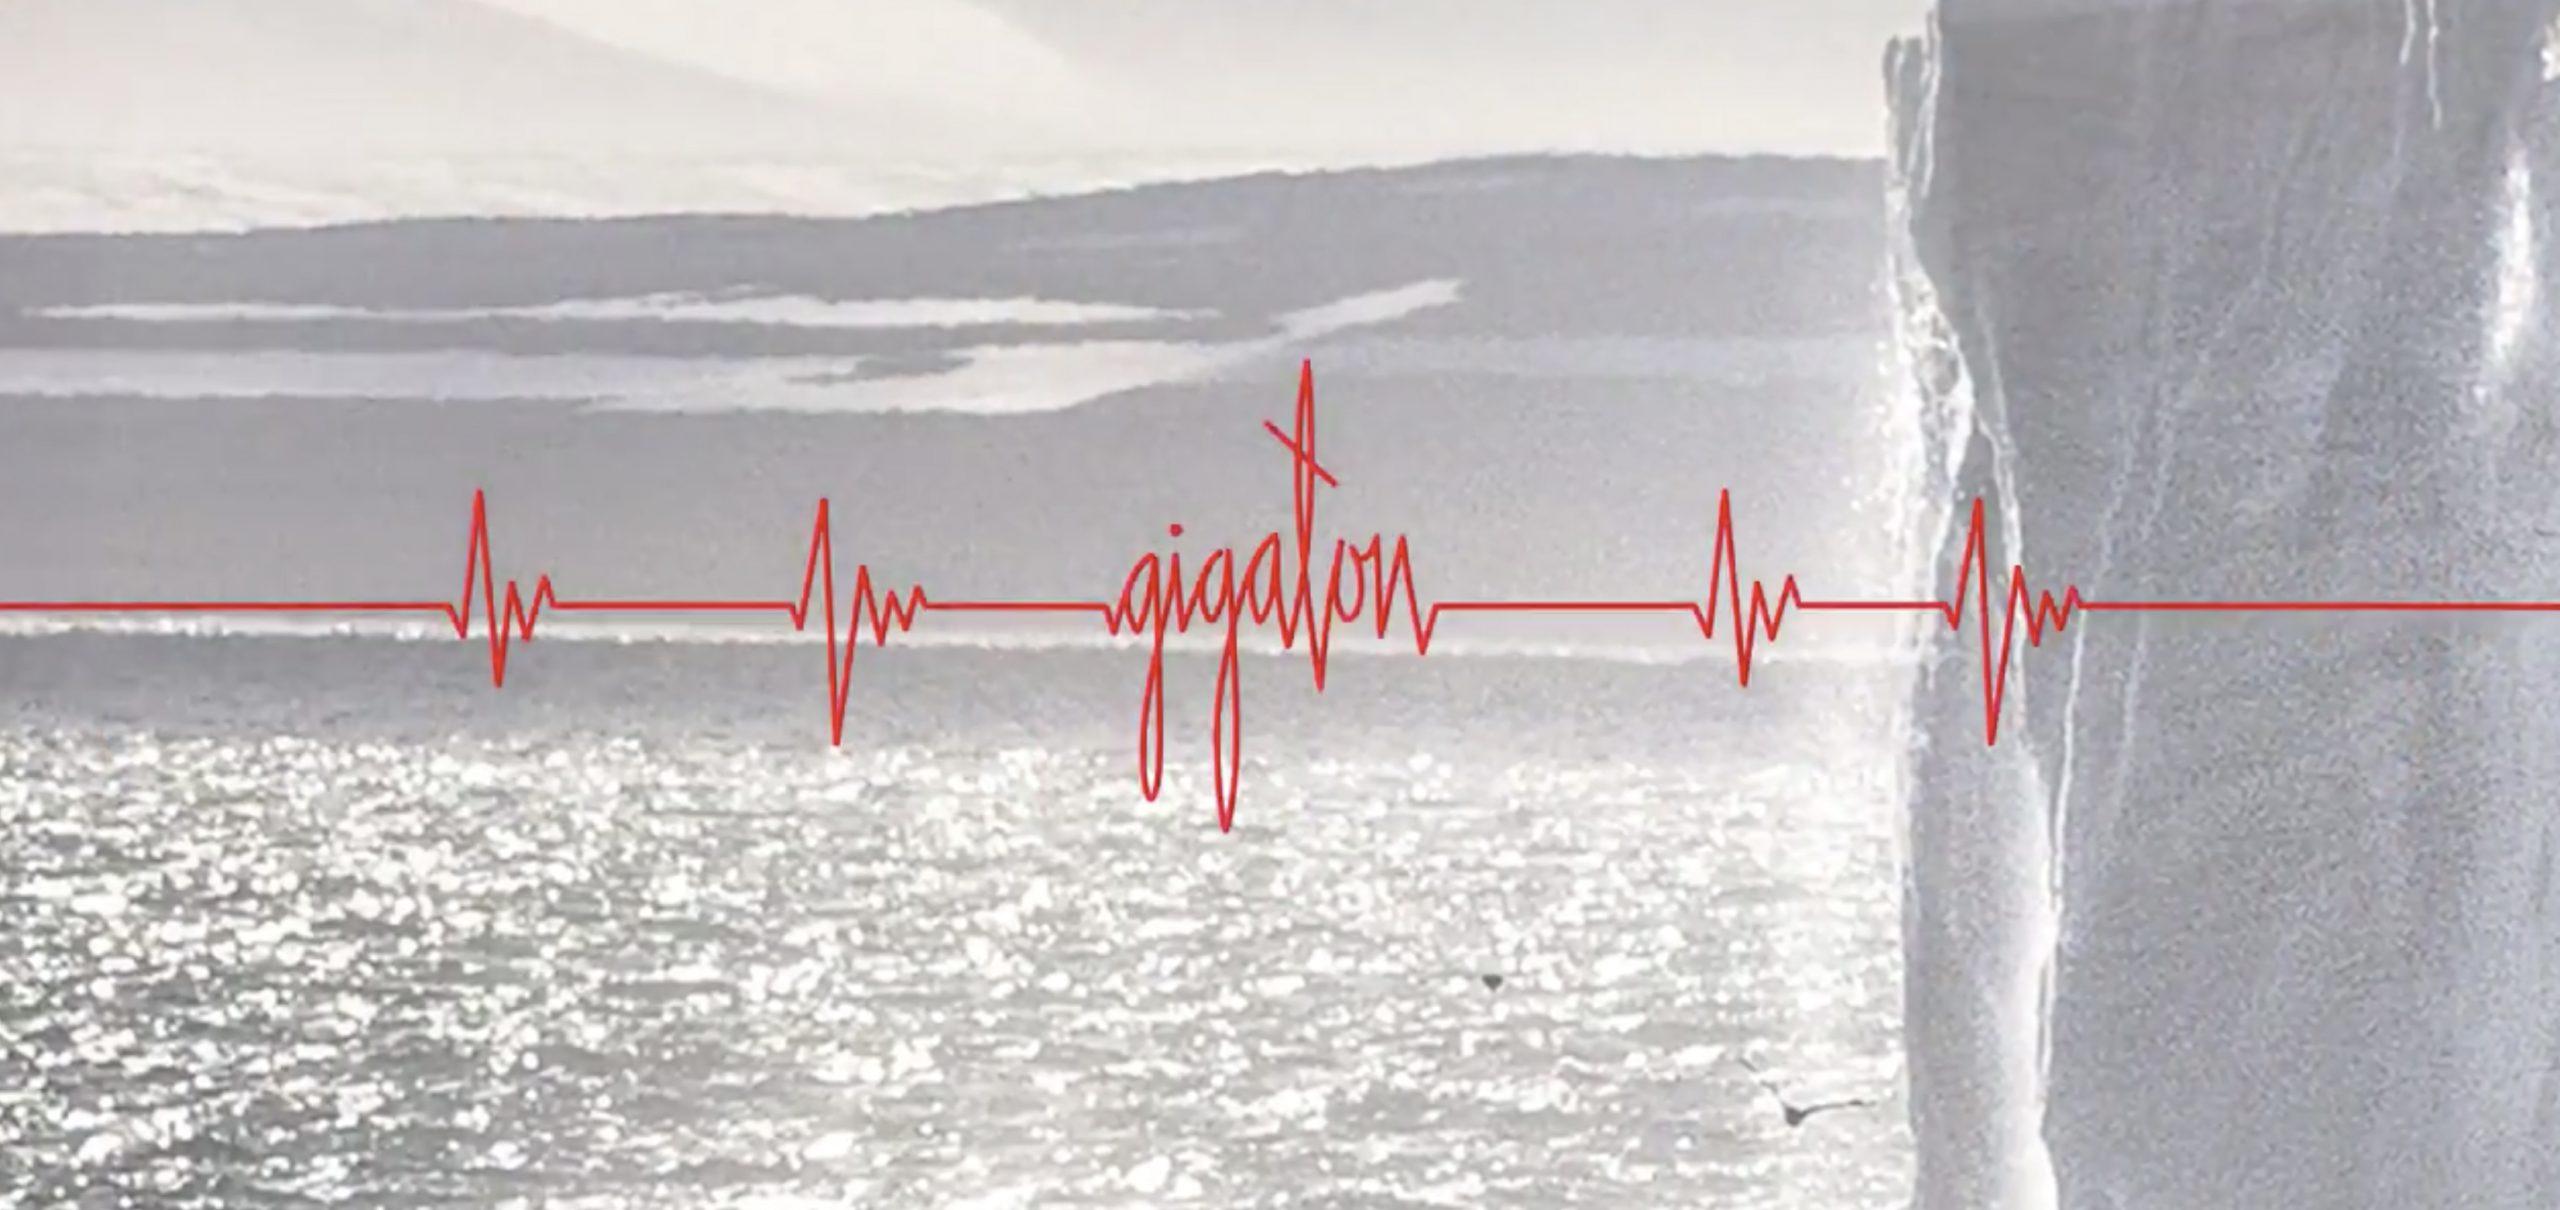 ¡Pearl Jam oficializa nuevo álbum 'Gigaton' y anuncia gira en Norte América!